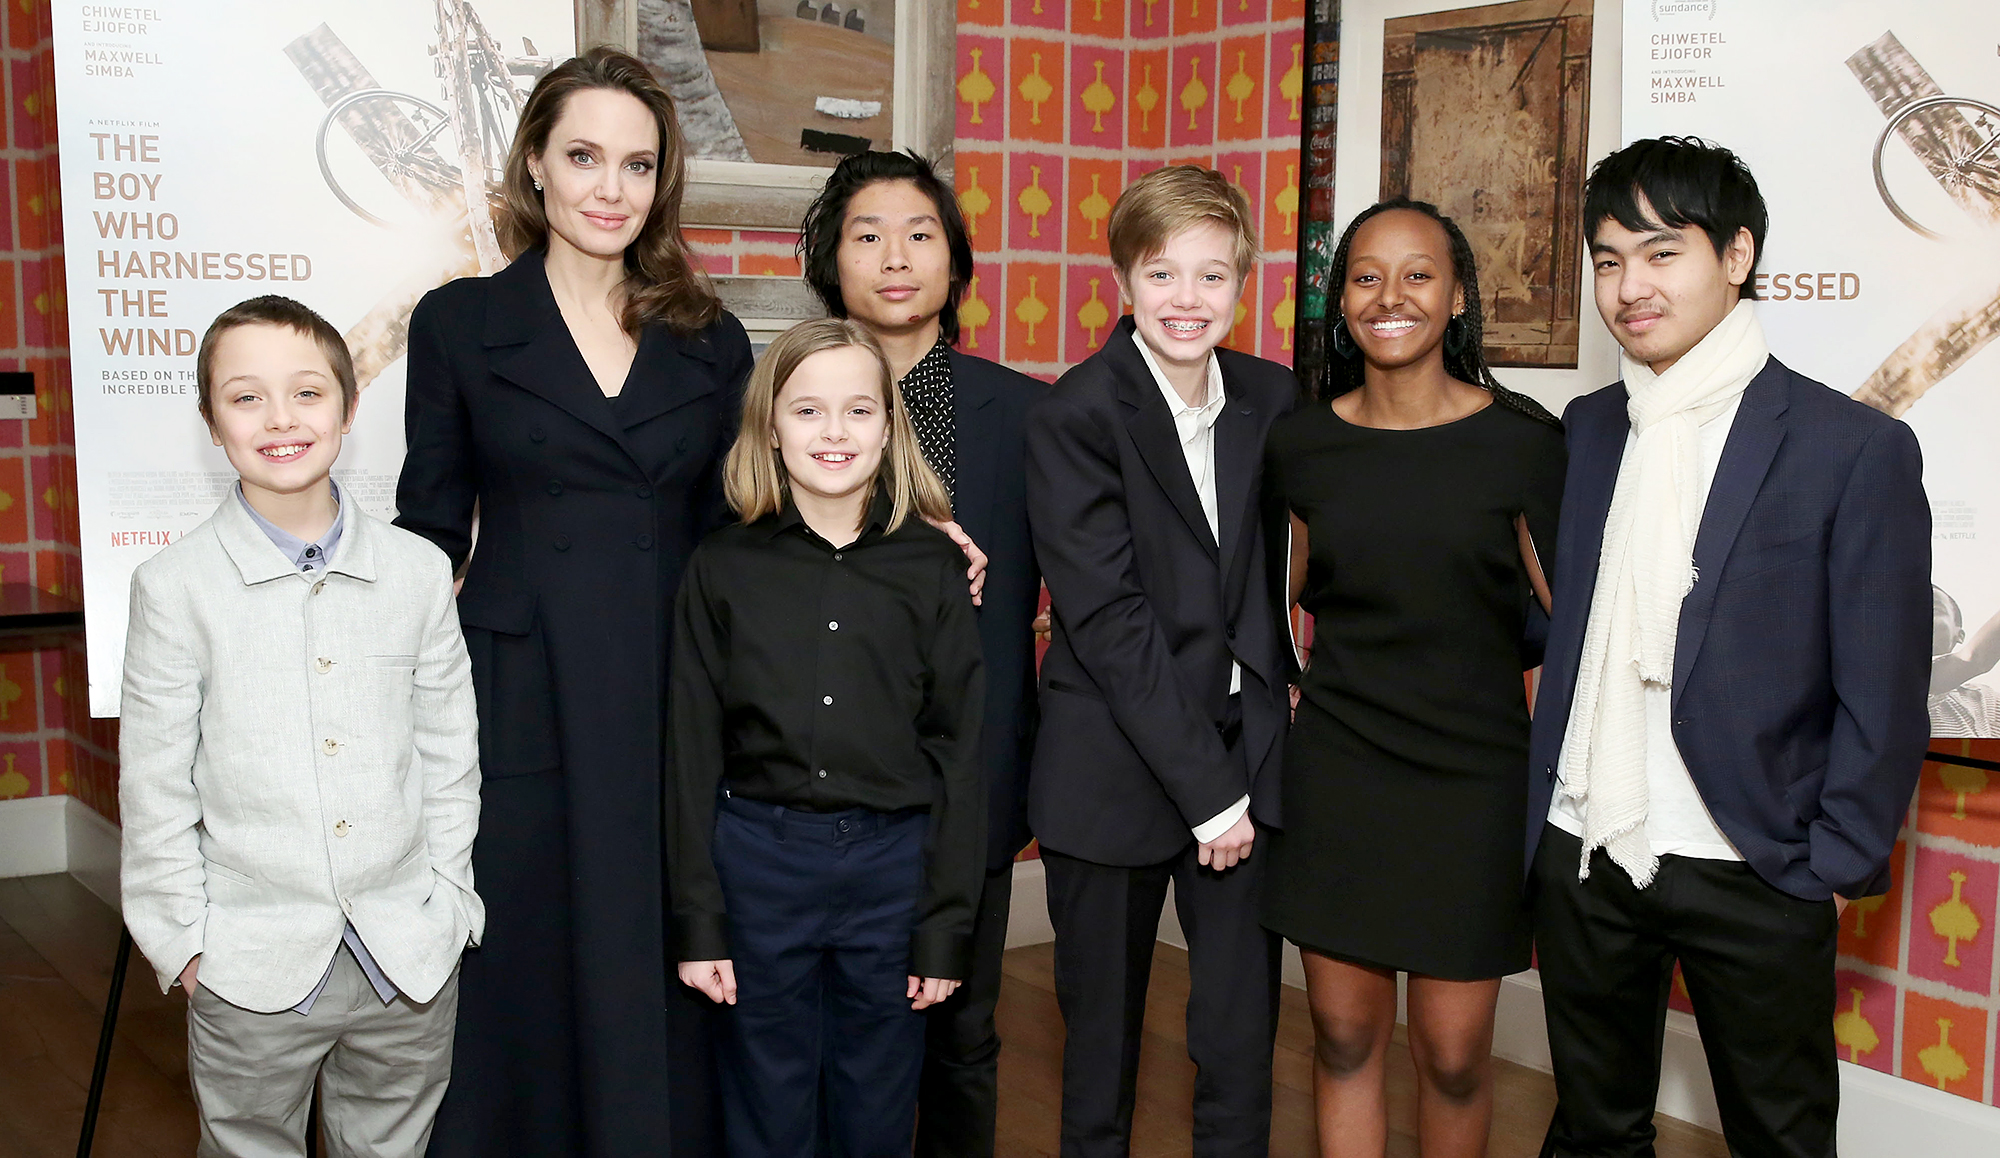 Angelina-Jolie-with-children-Knox-Leon-Jolie-Pitt,-Vivienne-Marcheline-Jolie-Pitt,-Pax-Thien-Jolie-Pitt,-Shiloh-Nouvel-Jolie-Pitt,-Zahara-Marley-Jolie-Pitt-and-Maddox-Chivan-Jolie-Pitt